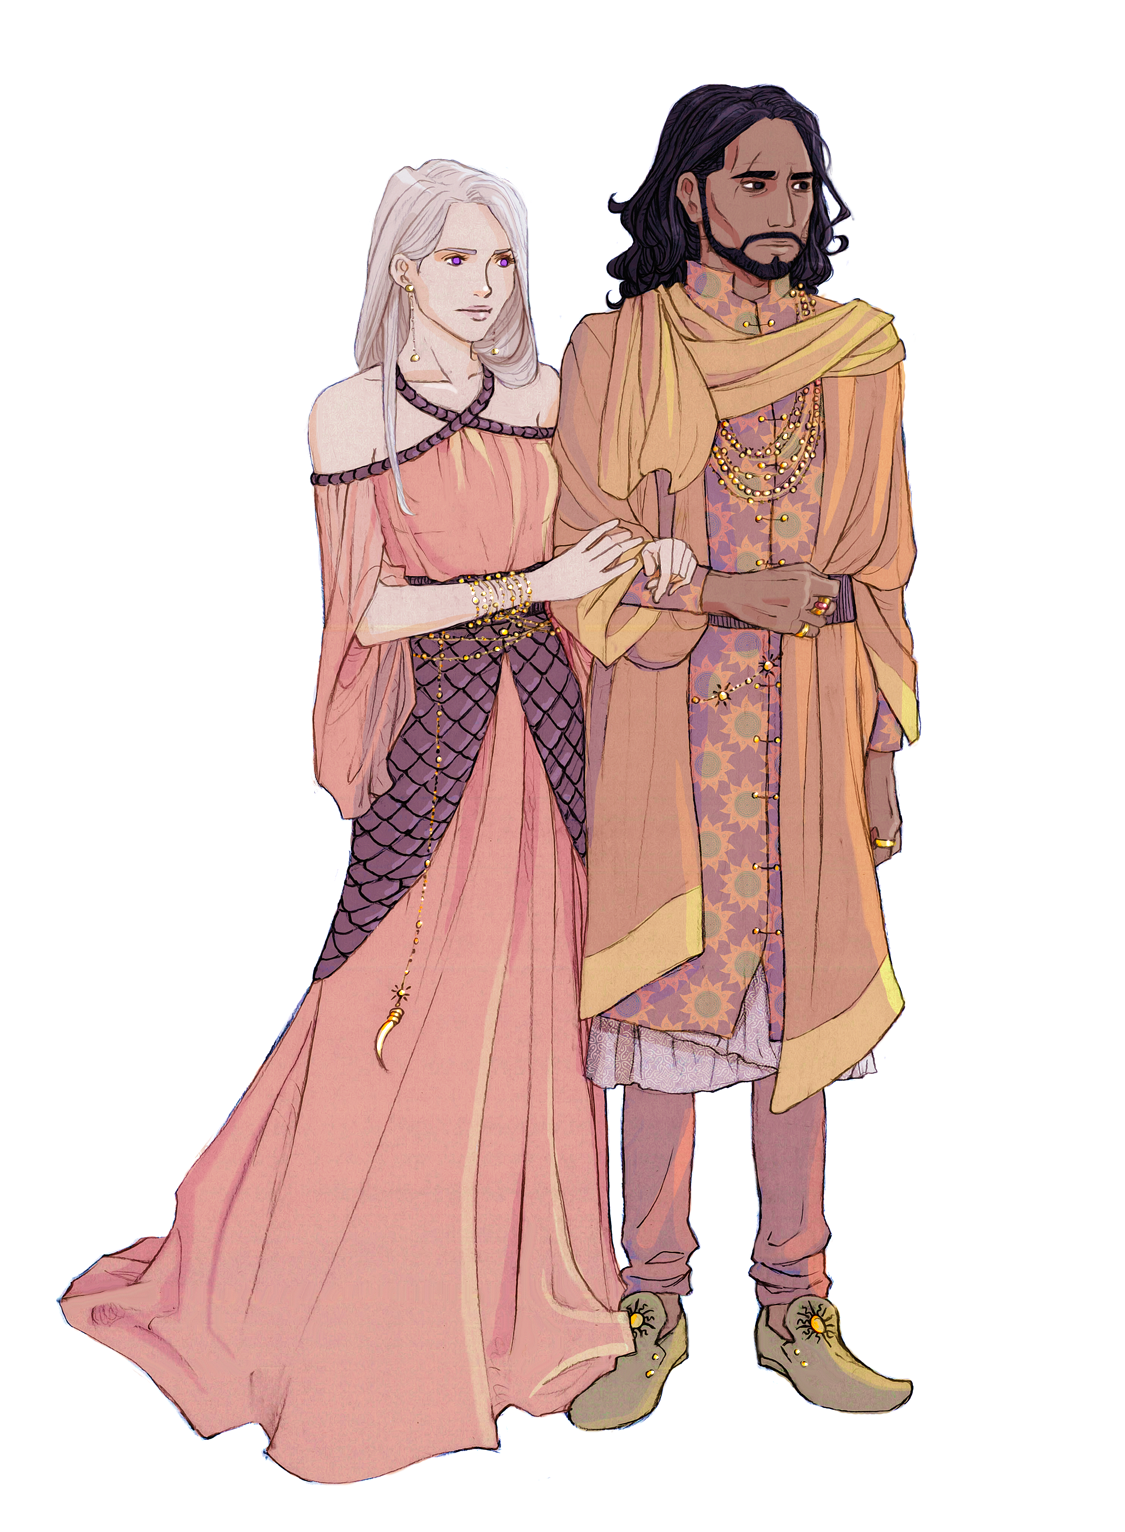 Maron and Daenerys Martell